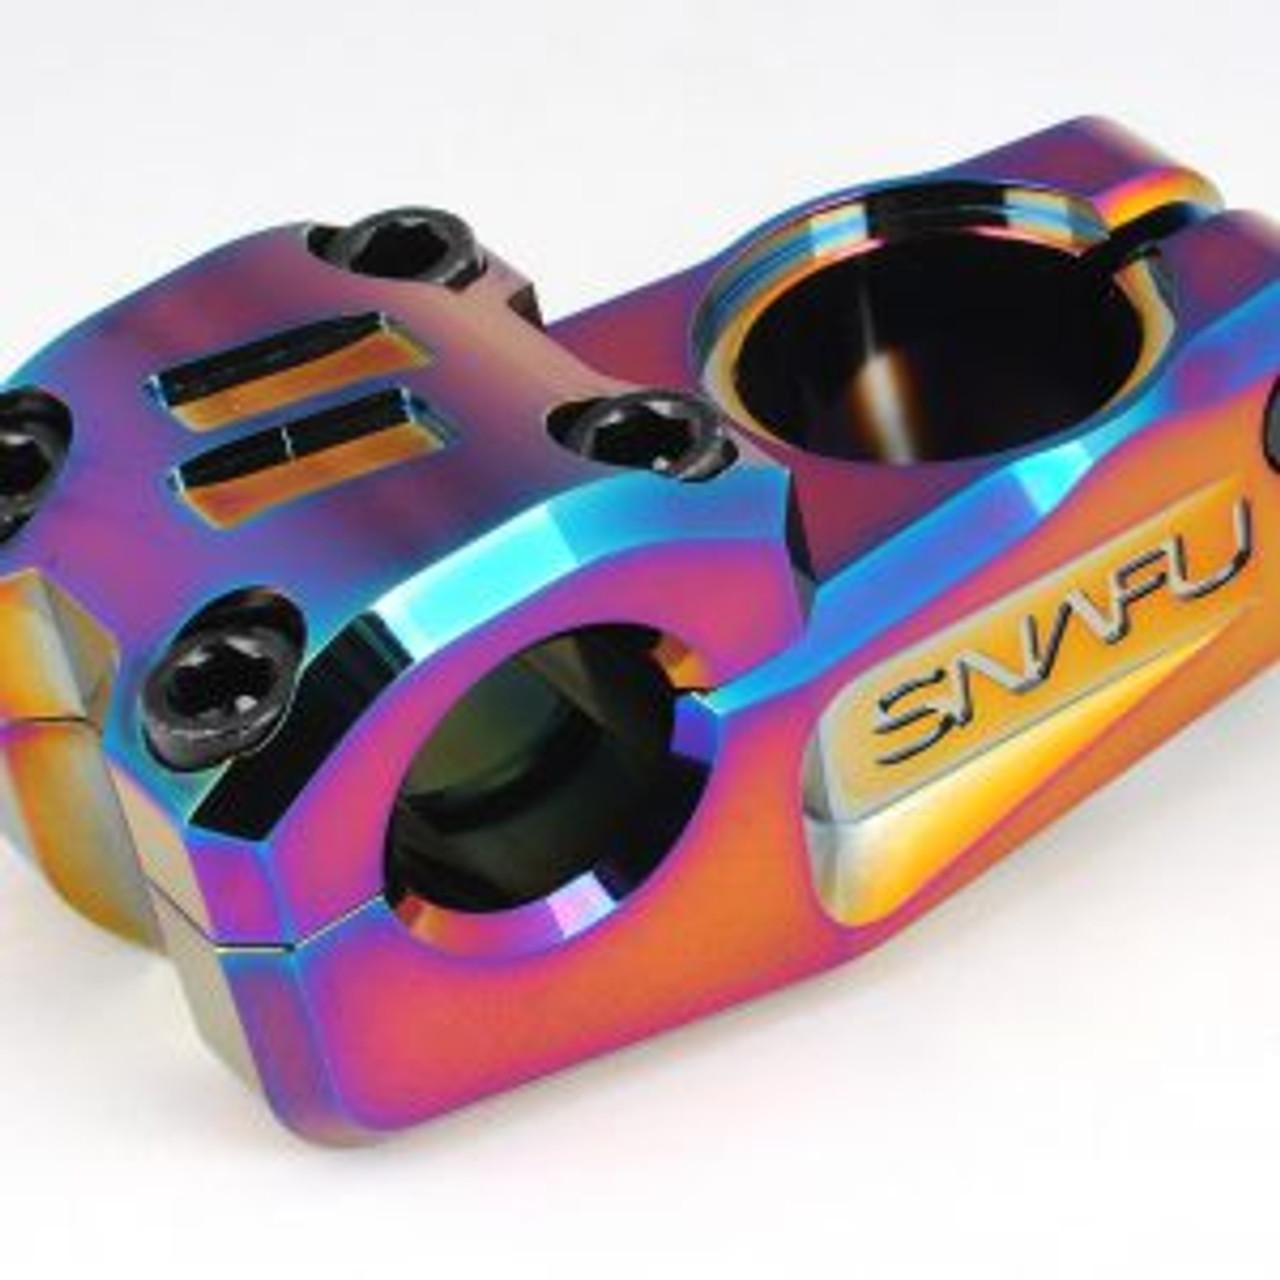 SNAFU TOP LOAD STEM V.2